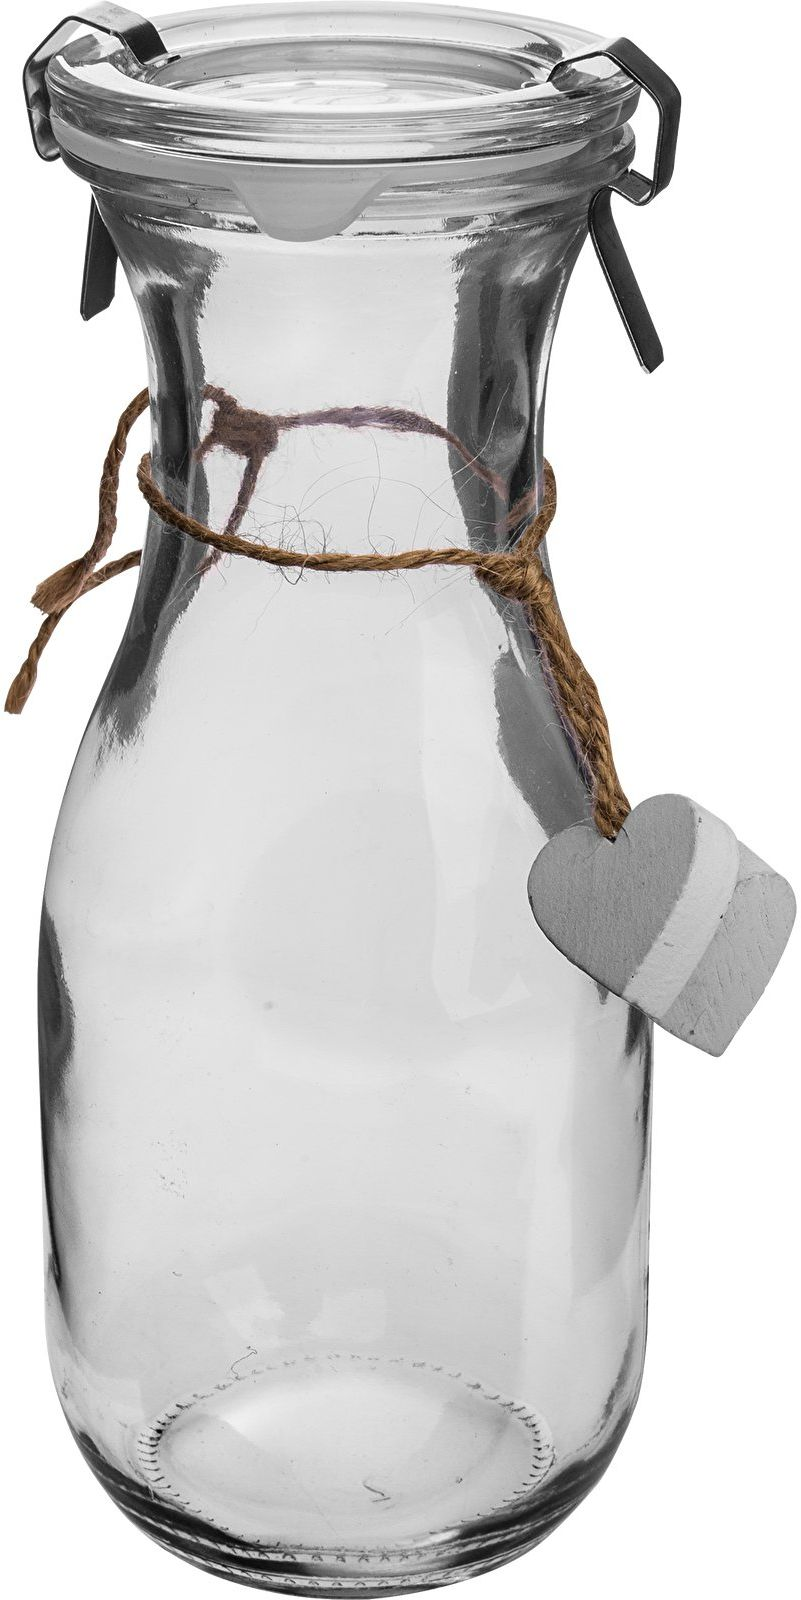 Butelka Od Serca - biała, z zamknięciem, 480ml